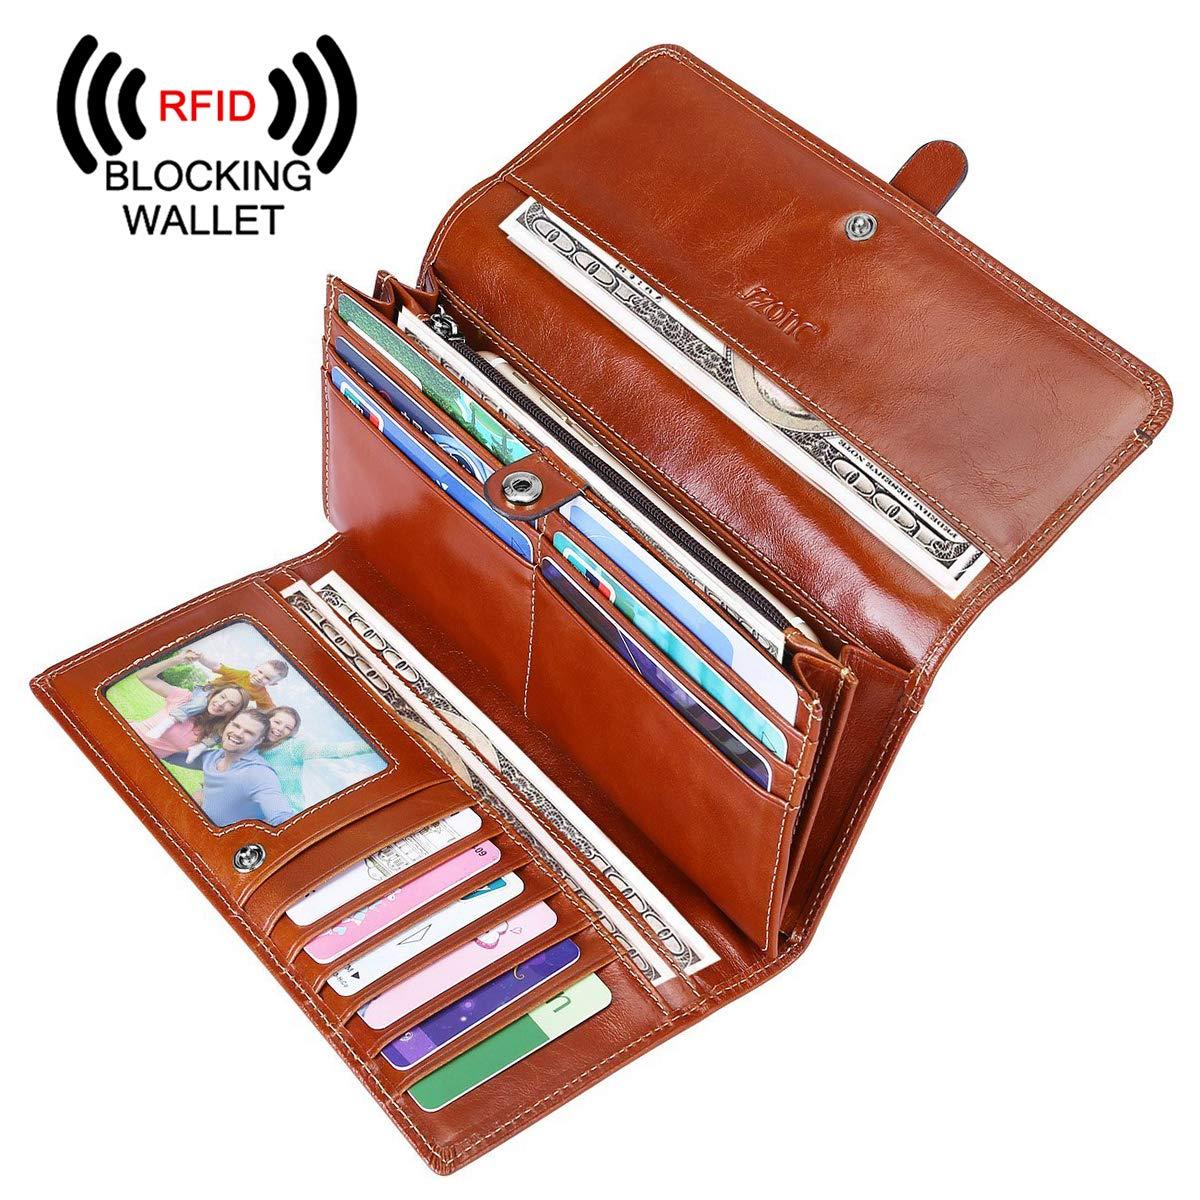 S-ZONE Women's Genuine Leather Long Organizer Tri-fold Wallet Clutch Purse (Maroon) by S-ZONE (Image #1)